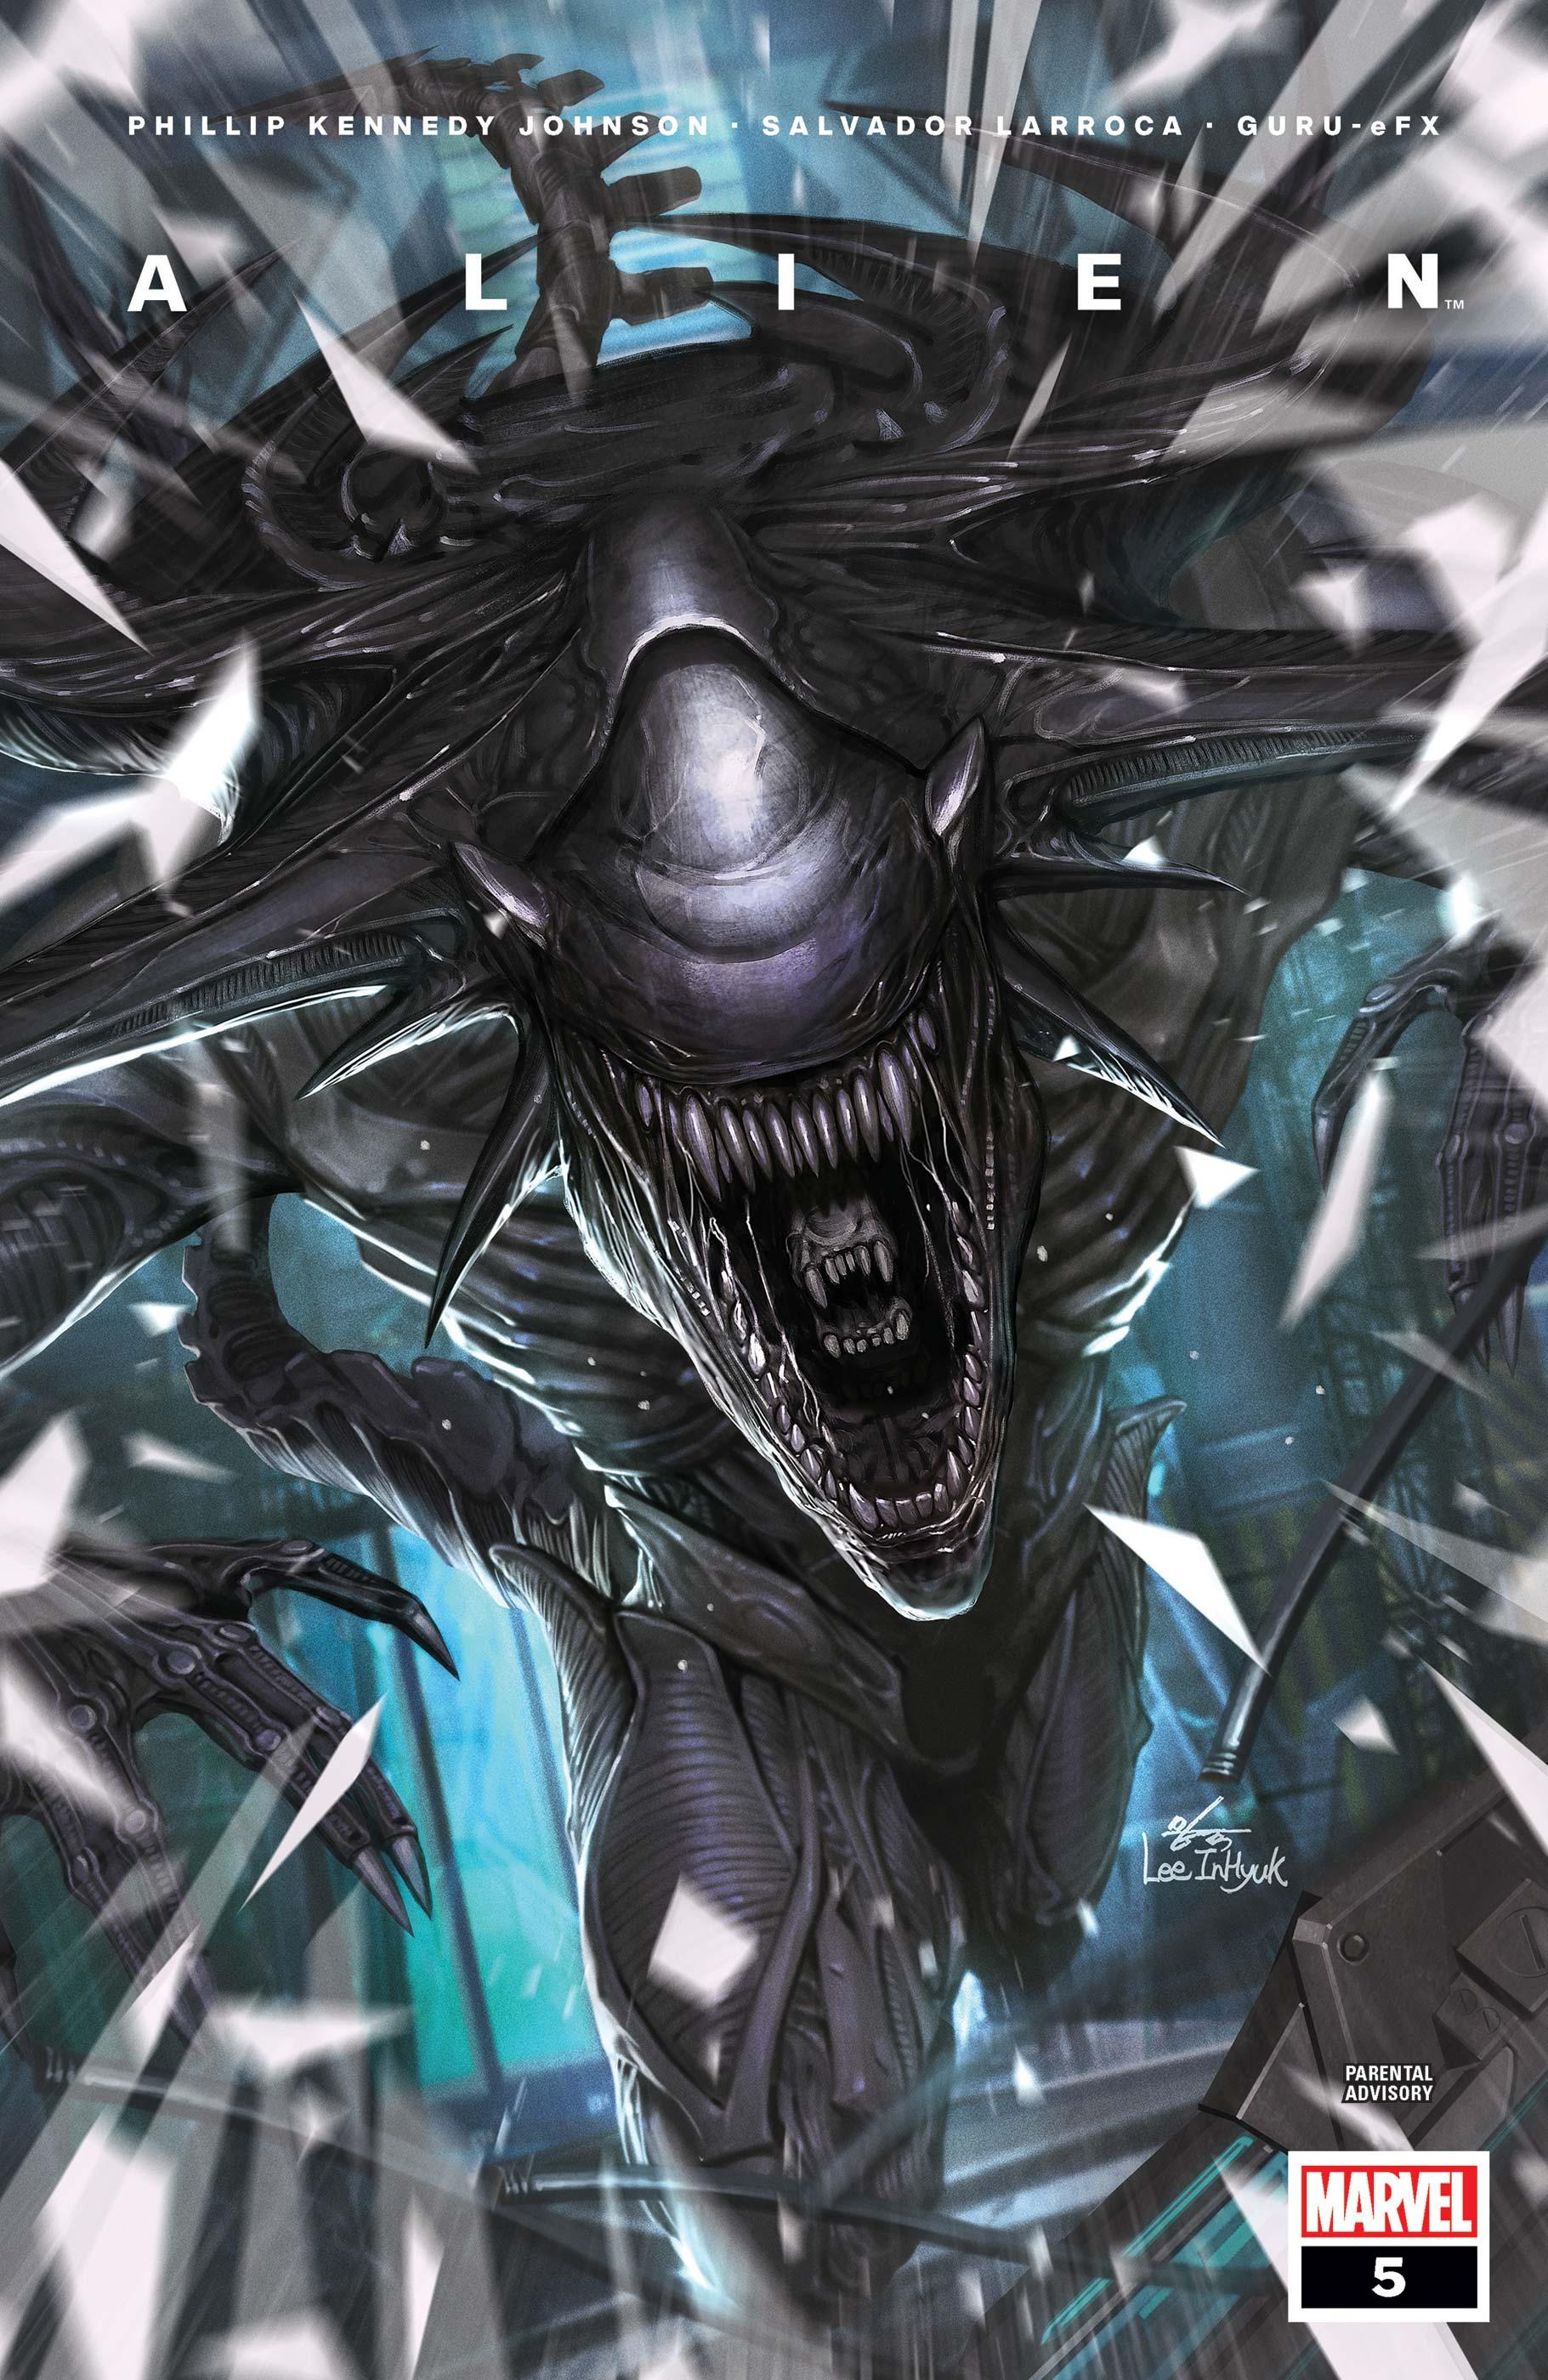 Alien #5 by Philip Kennedy Johnson